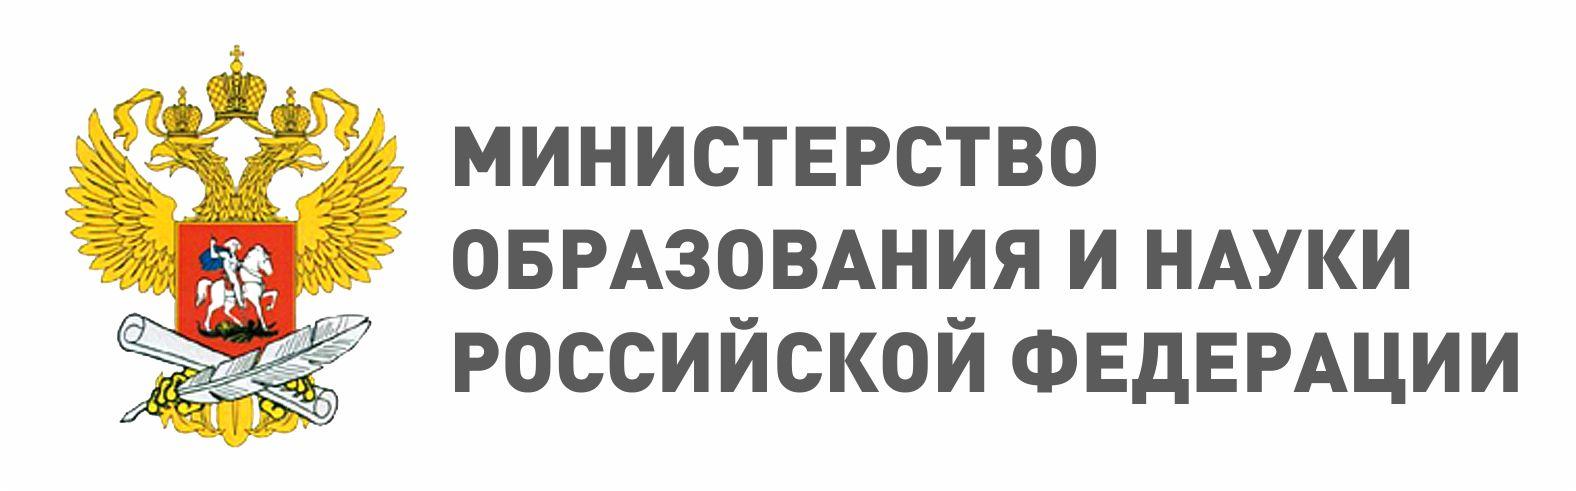 БАННЕР МИНИСТЕРСТВА ОБРАЗОВАНИЯ И НАУКИ РФ